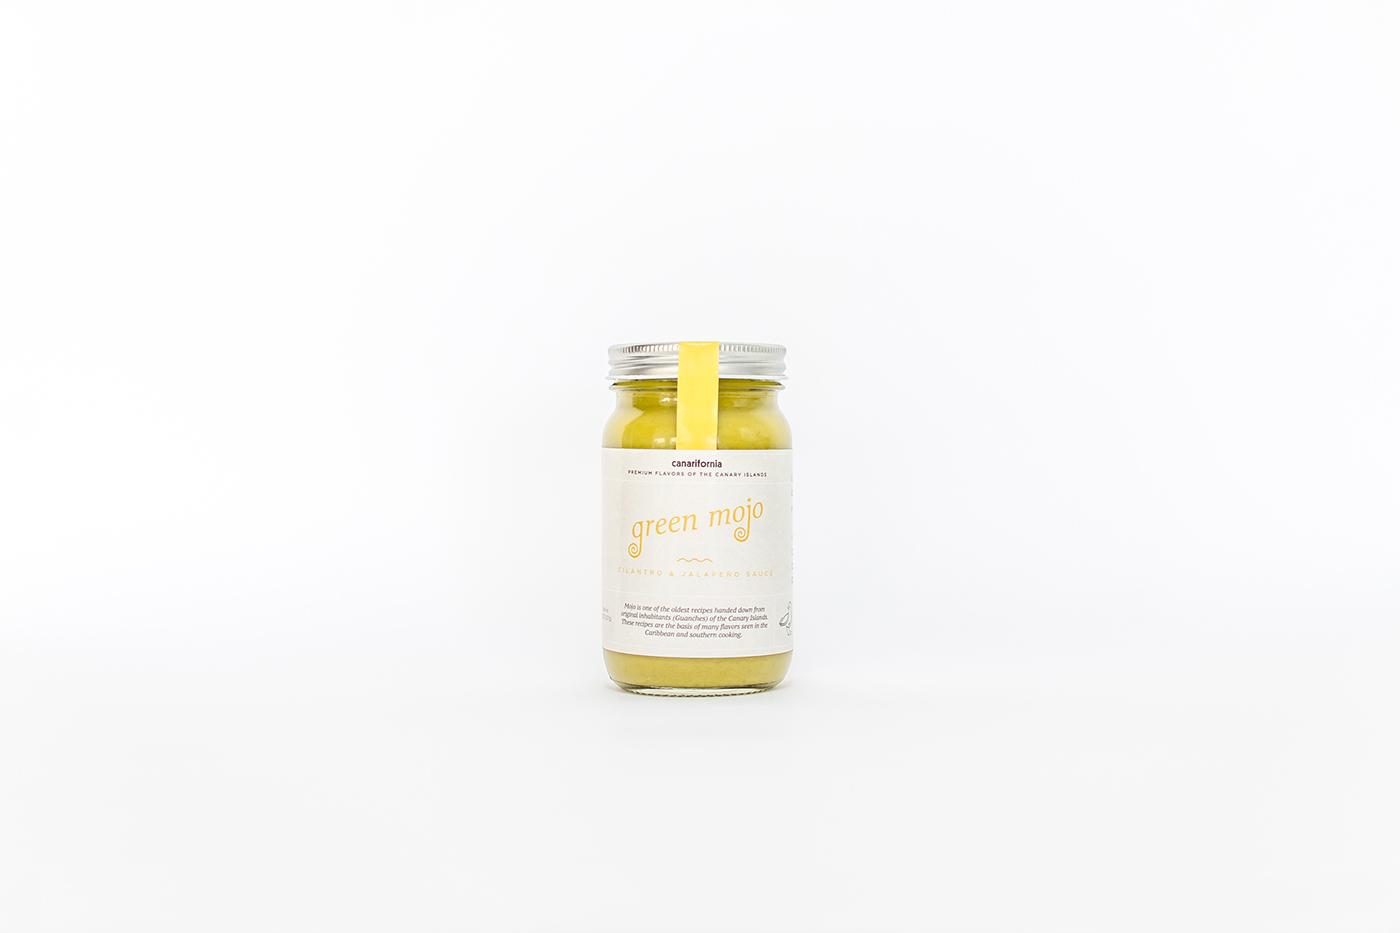 California Mojo sauce canary islands gourmet minimal brand colorful salsa inspiration